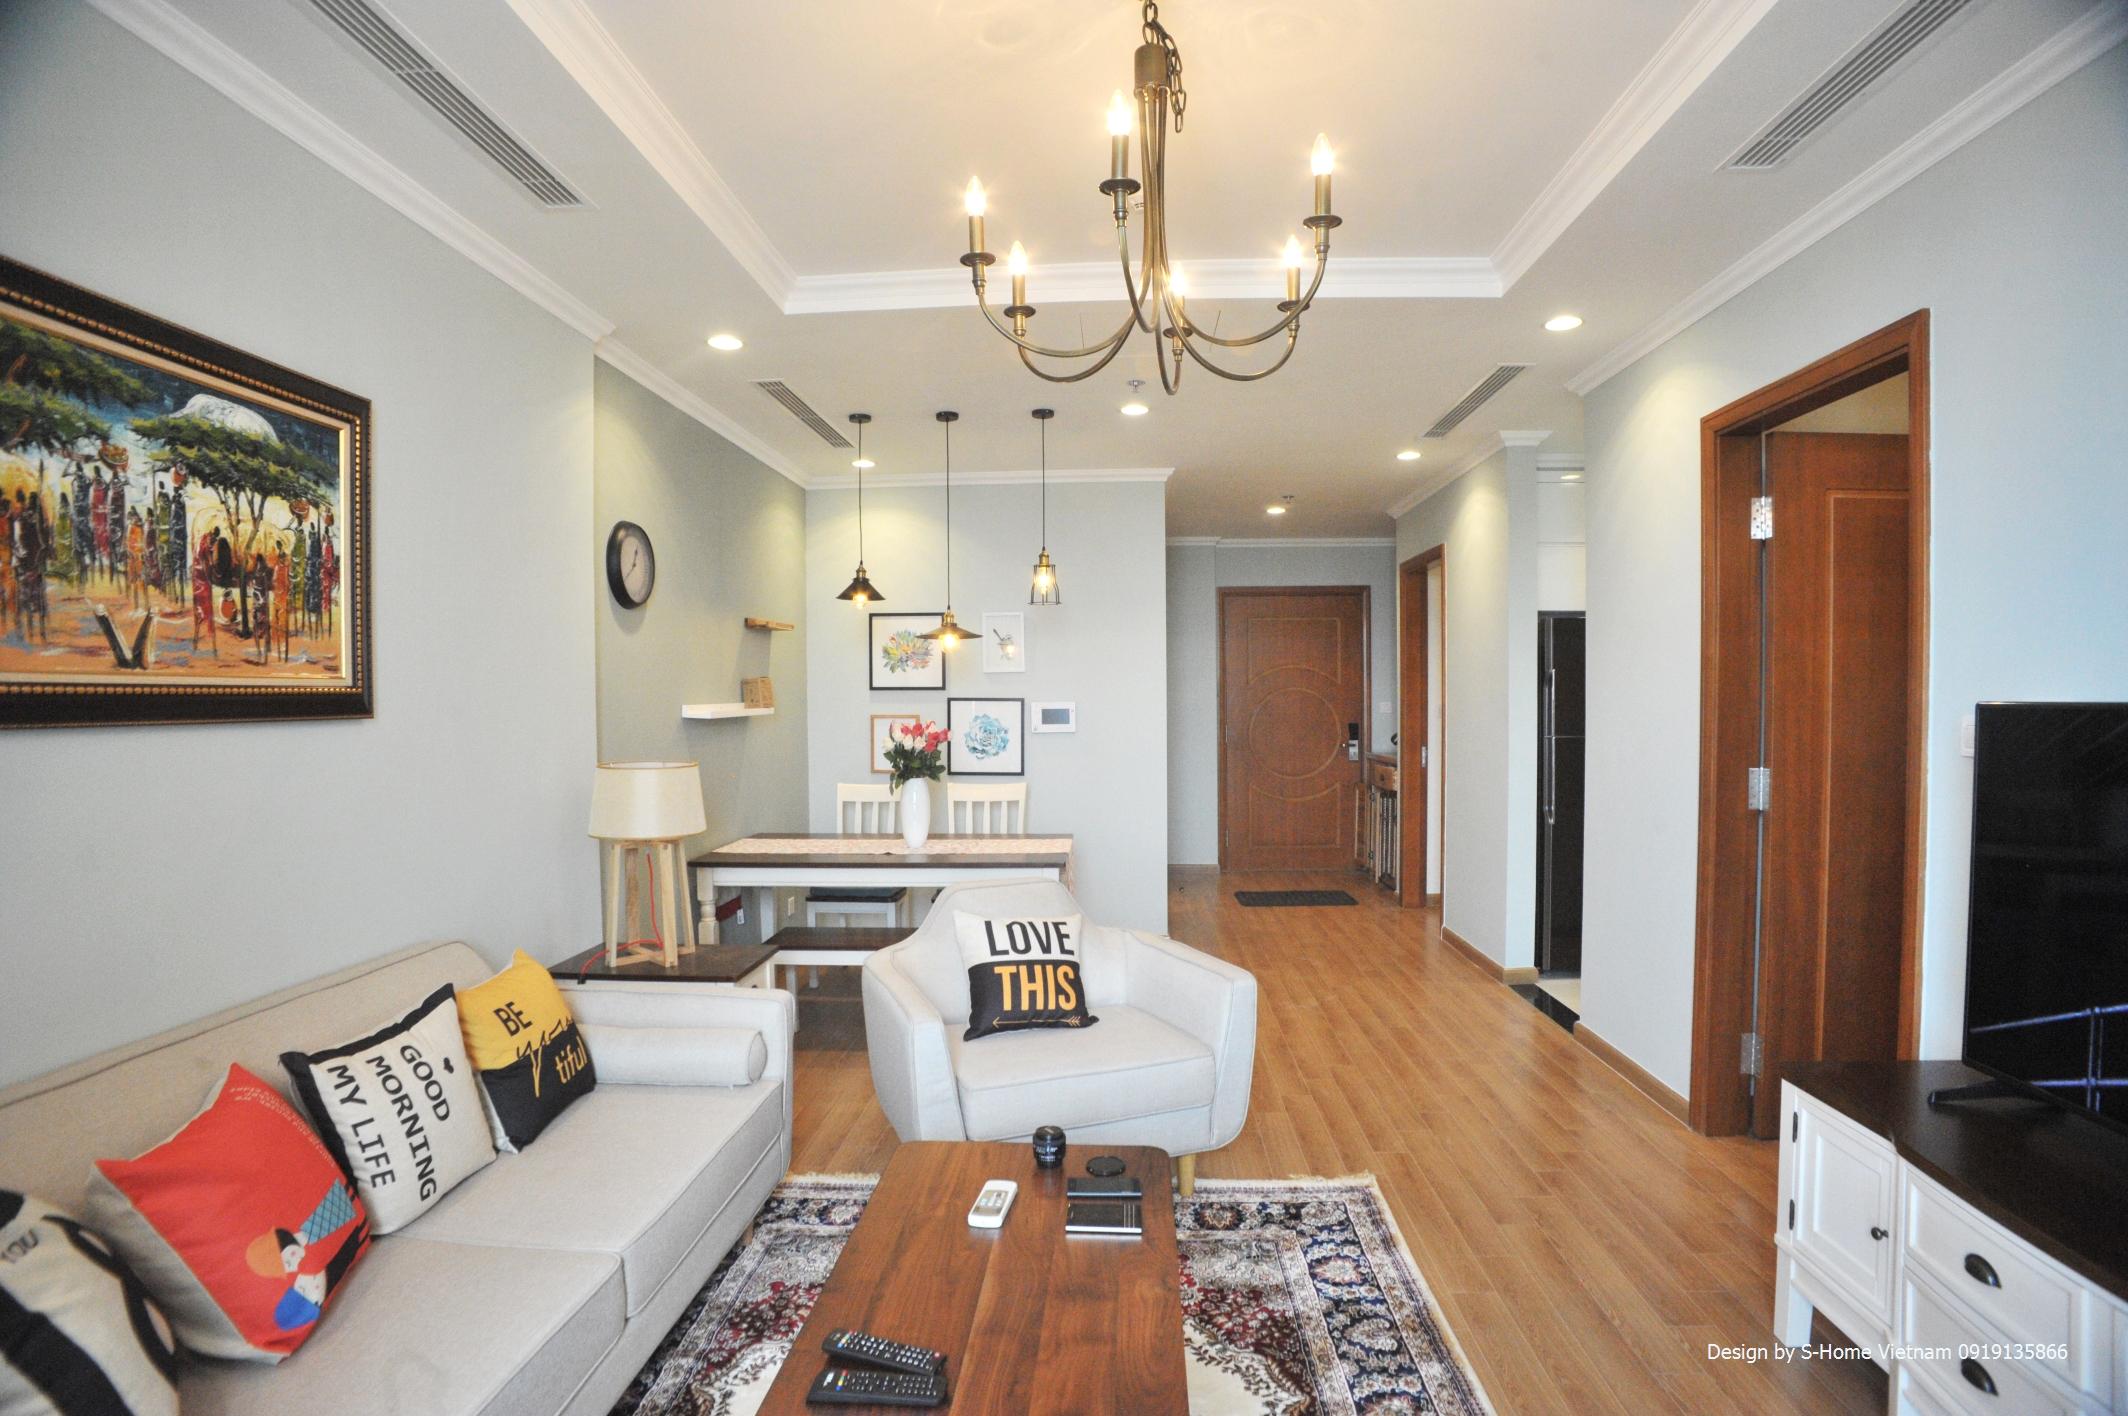 Vinhomes Nguyen Chi Thanh アパートにおける2BRお部屋です。